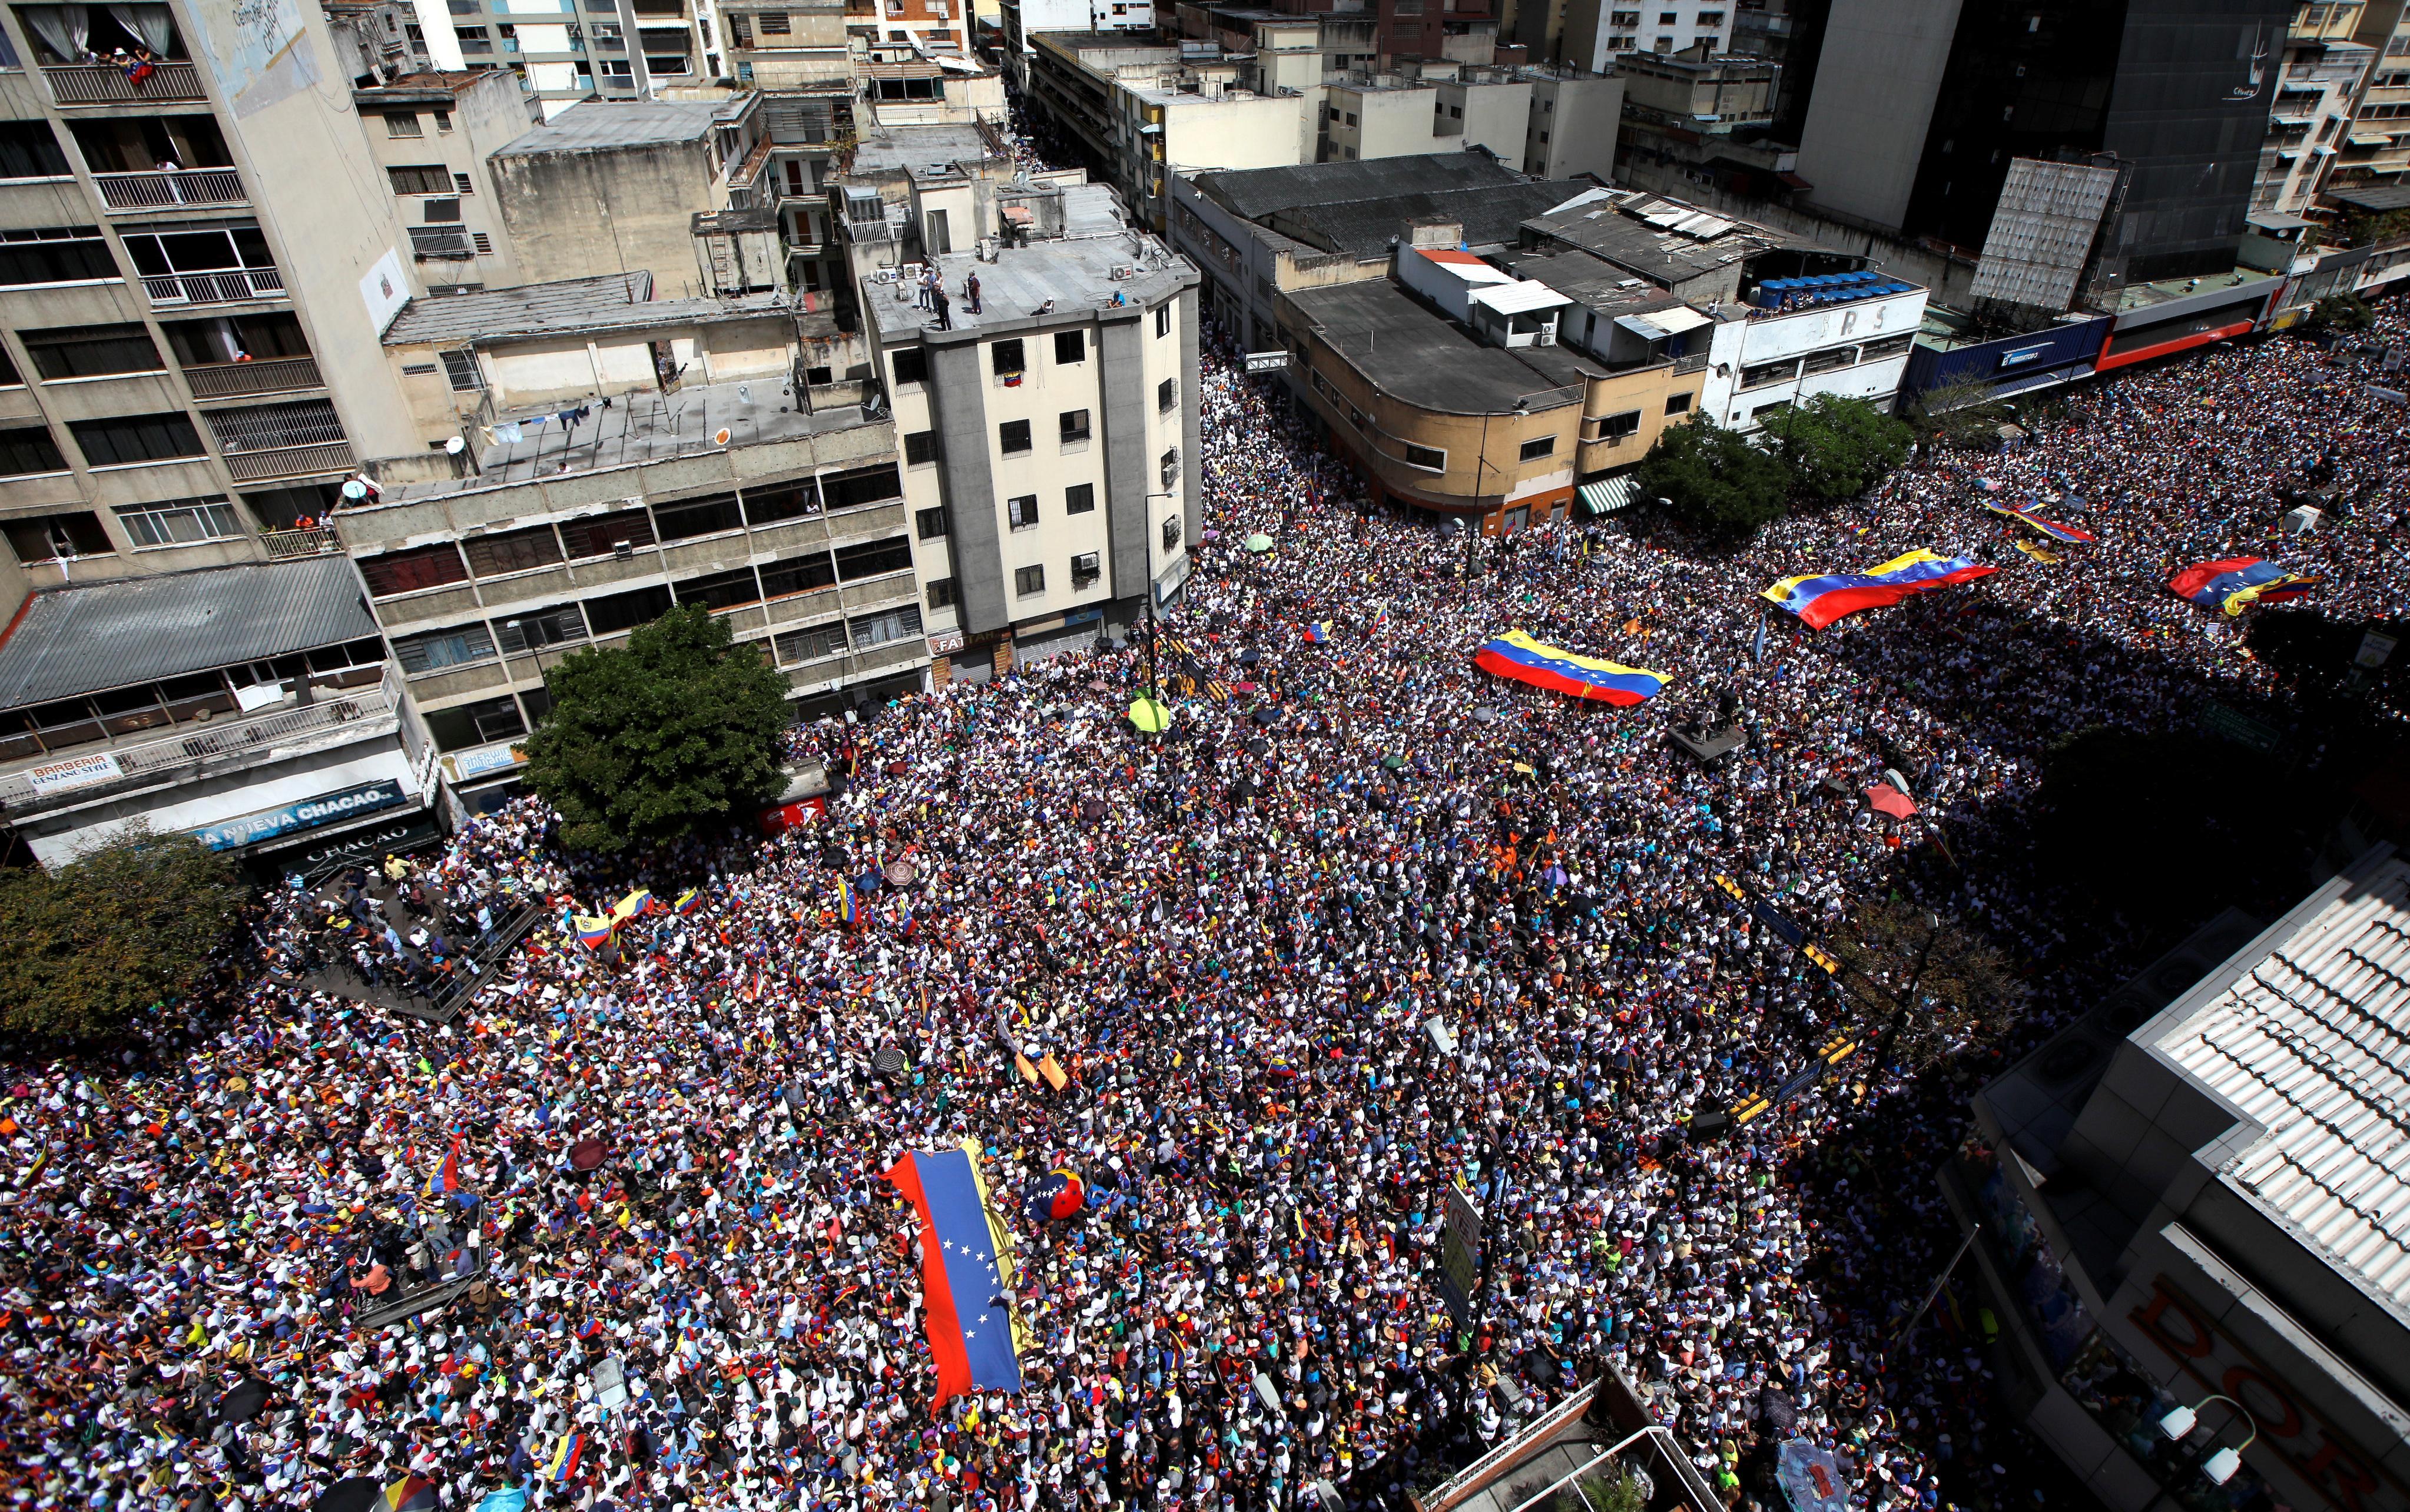 Cuba says U.S. moving special forces, preparing Venezuelan...